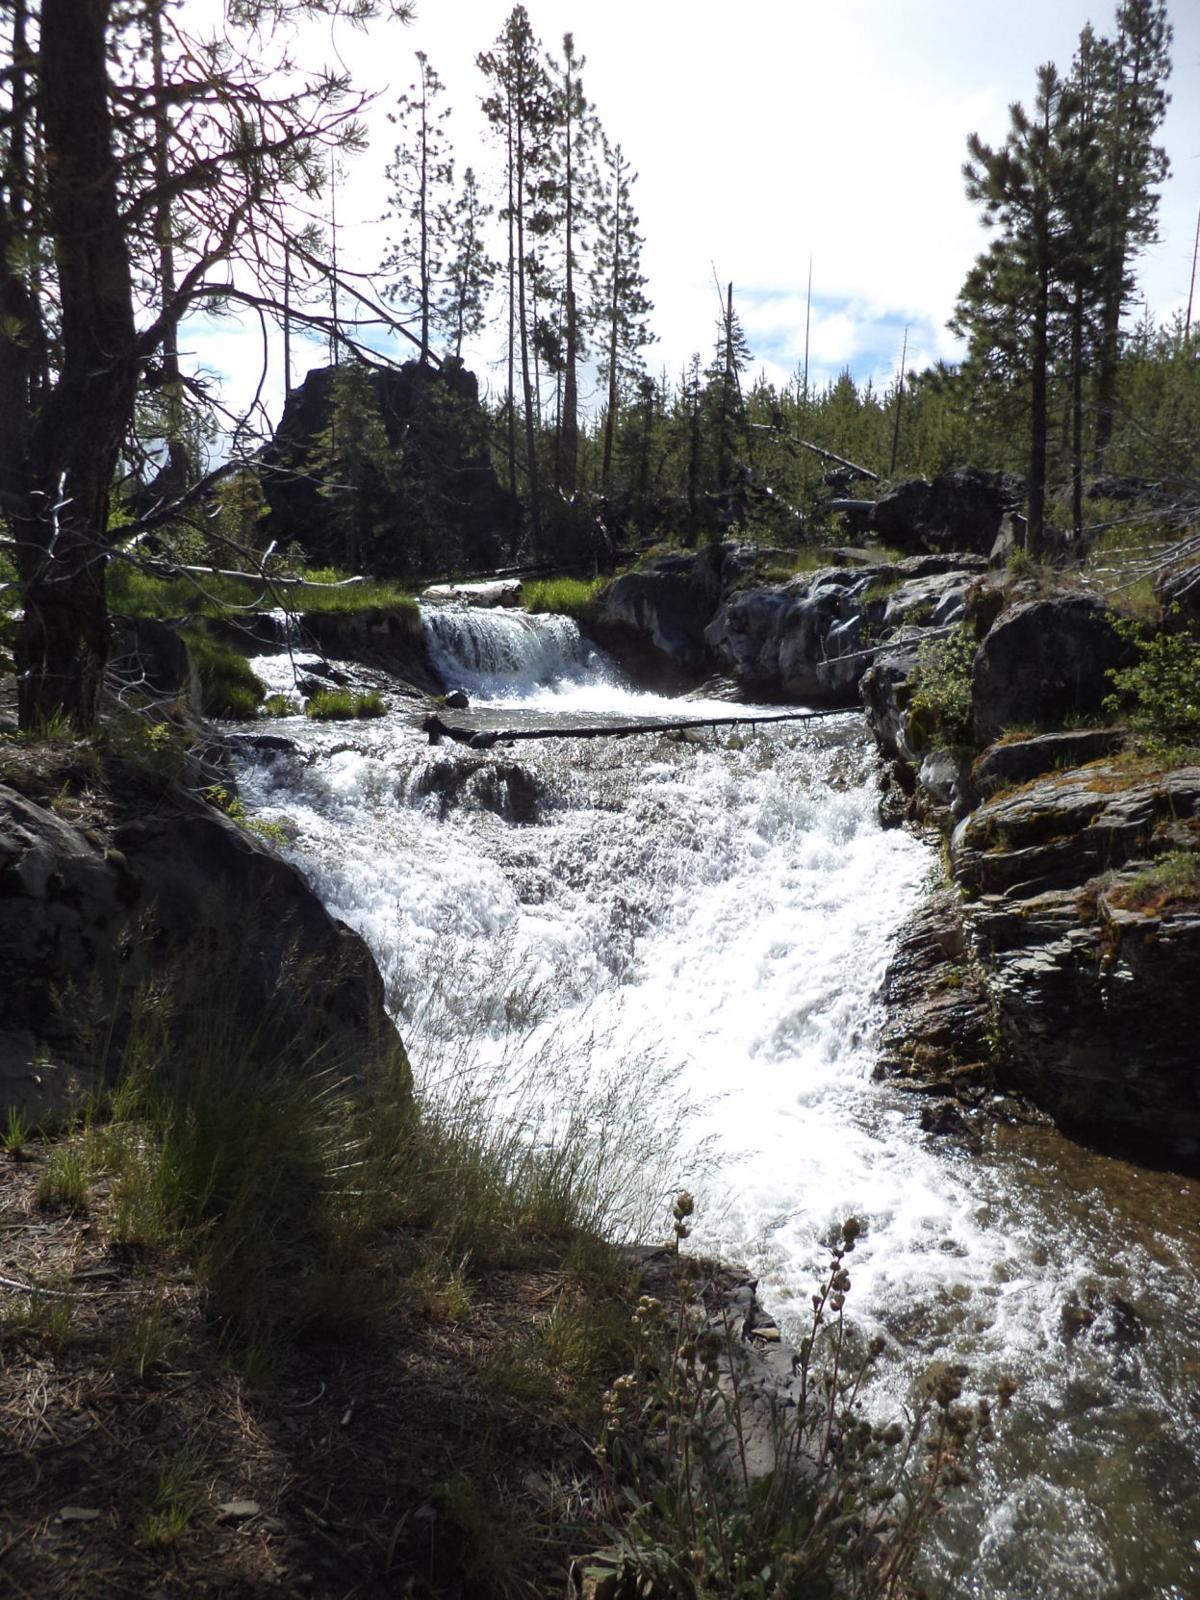 Hike Paulina Creek for sights, swimming holes